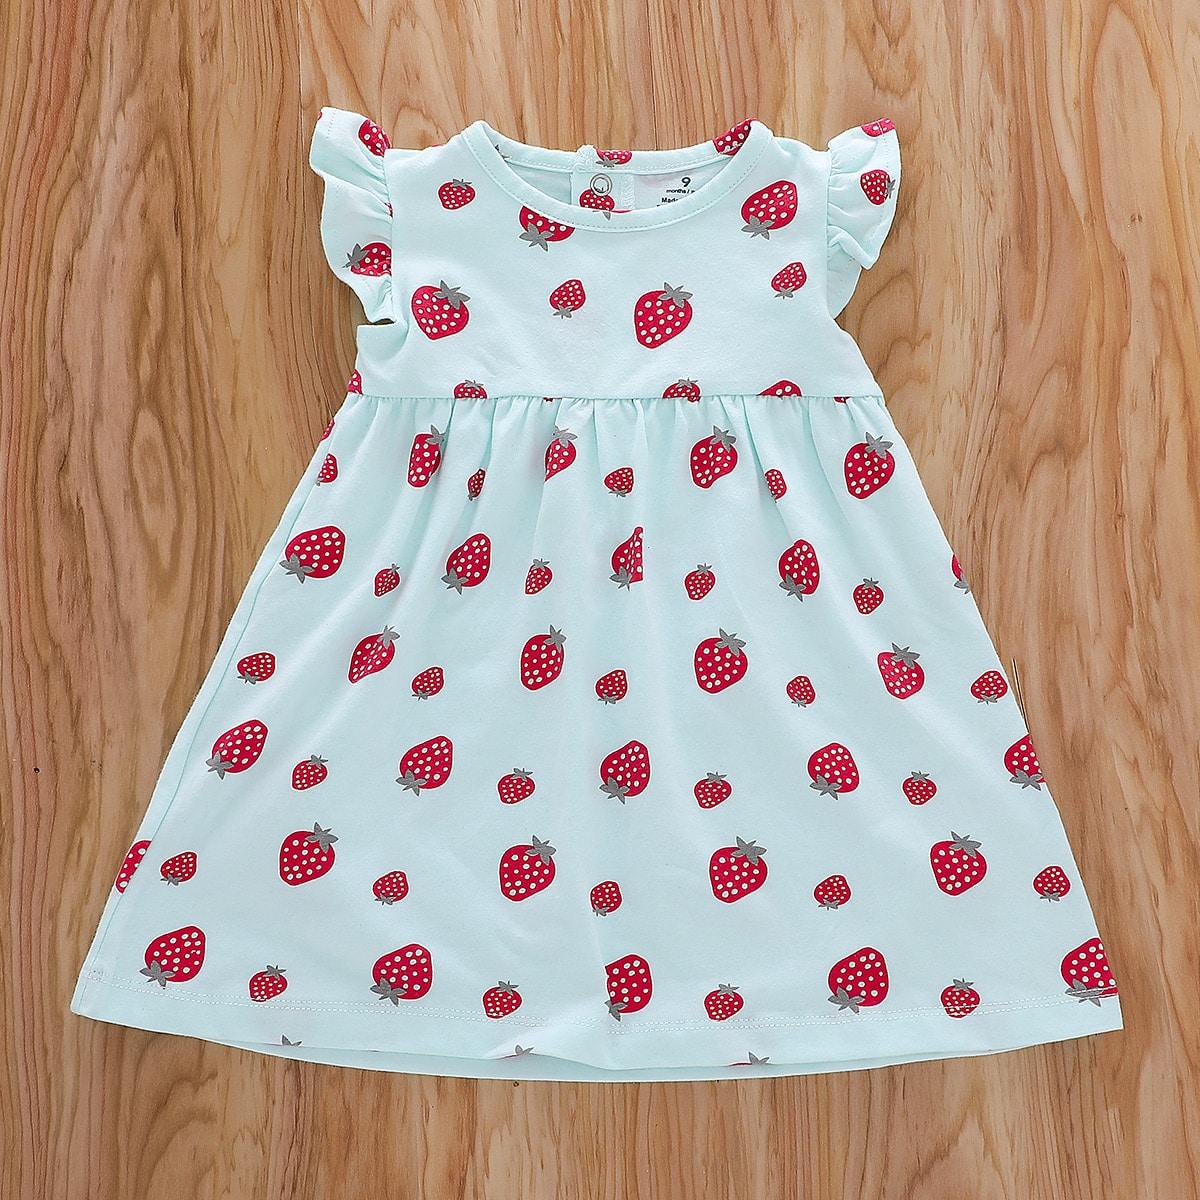 shein Casual Fruit & groenten Baby-jurk Rimpeling